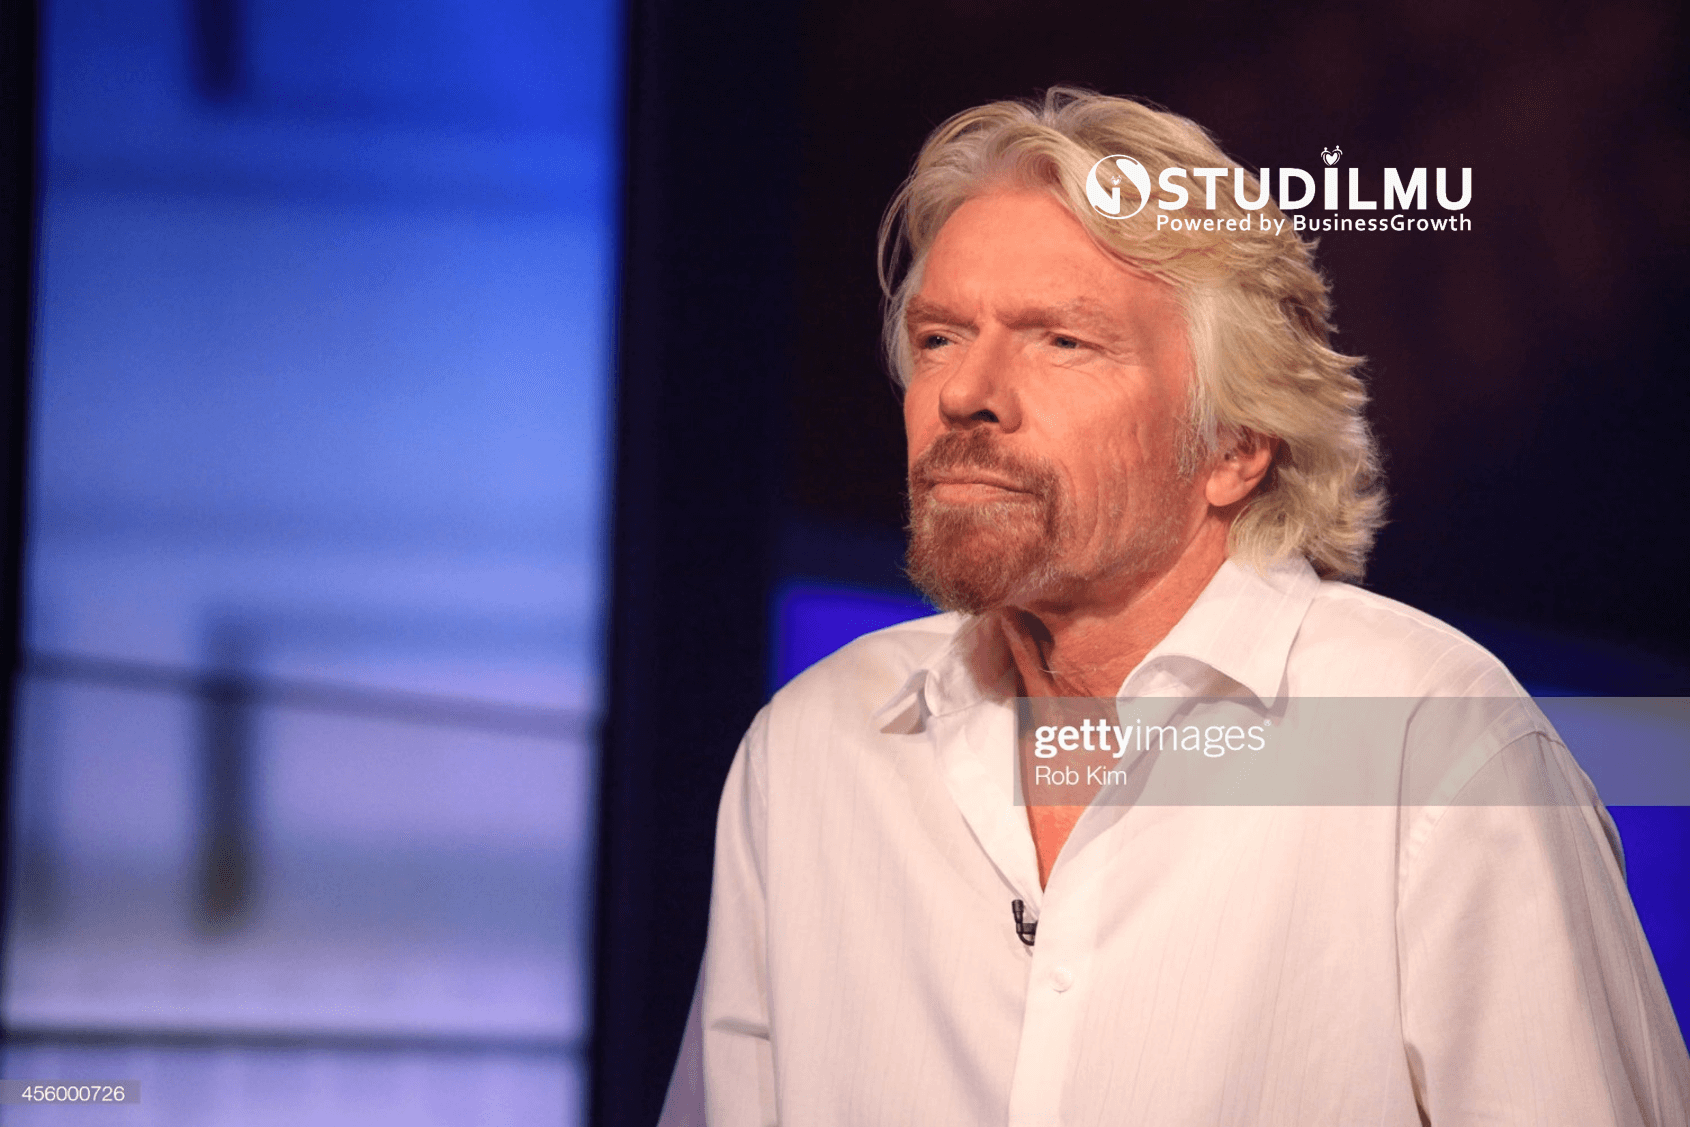 STUDILMU Career Advice - 8 Kunci Kebahagiaan dan Kesuksesan ala Richard Branson